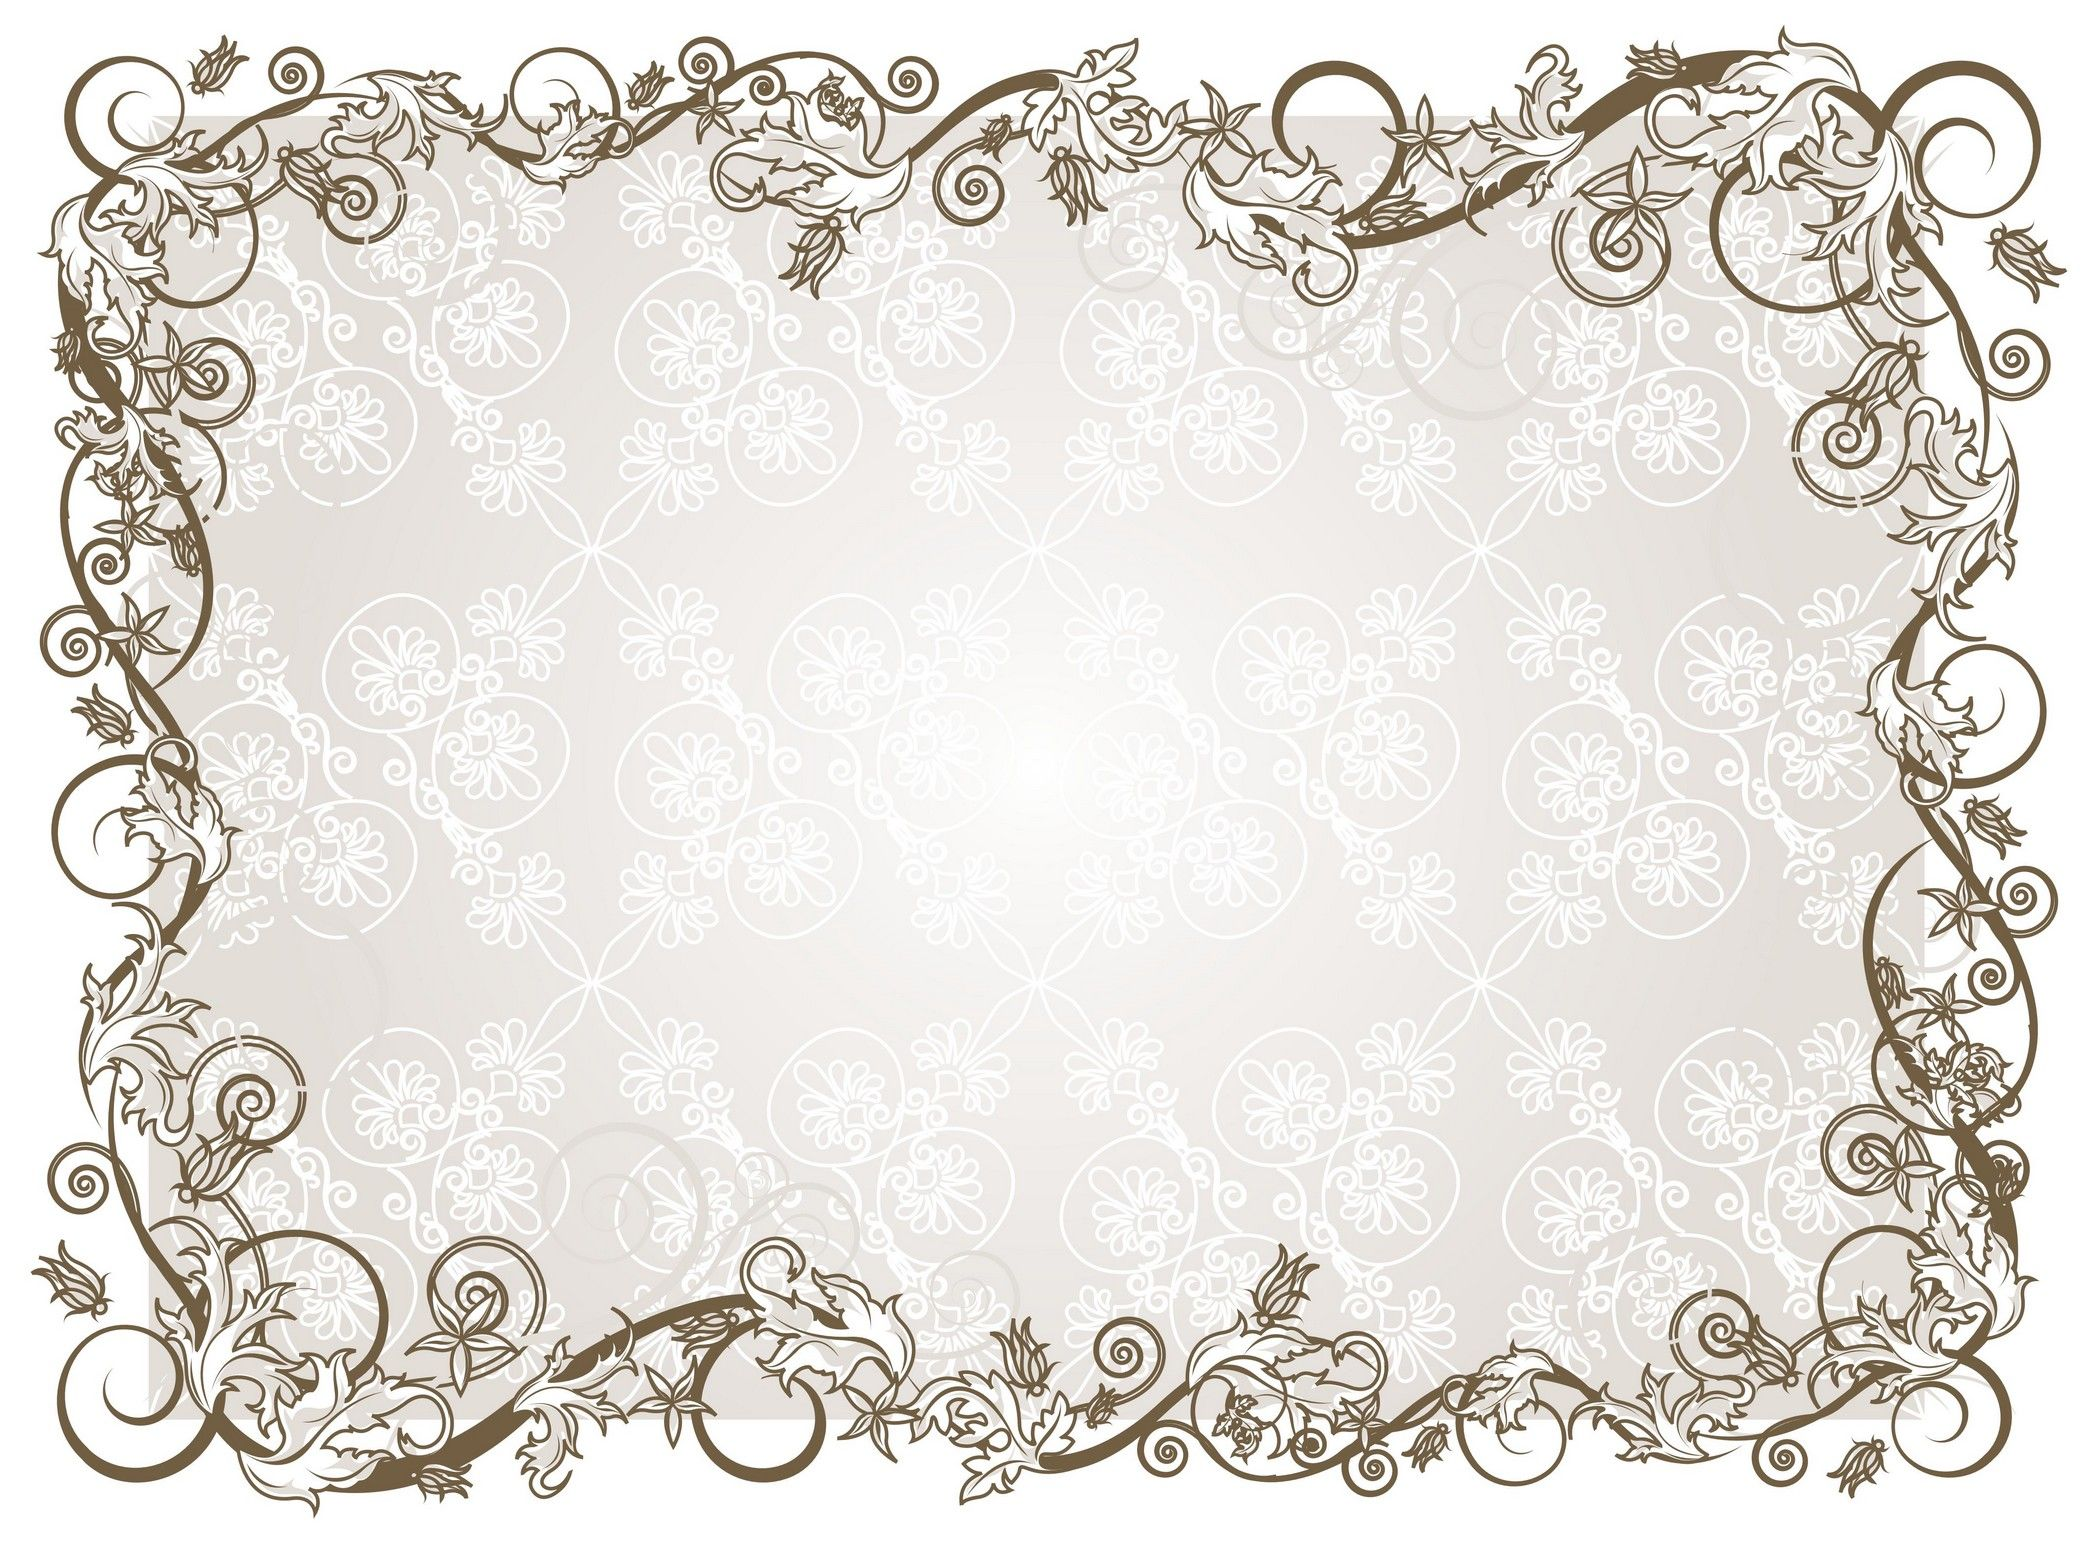 2100x1542 Vintage Frame [Eps File] Vector Eps Free Download, Logo , Icons